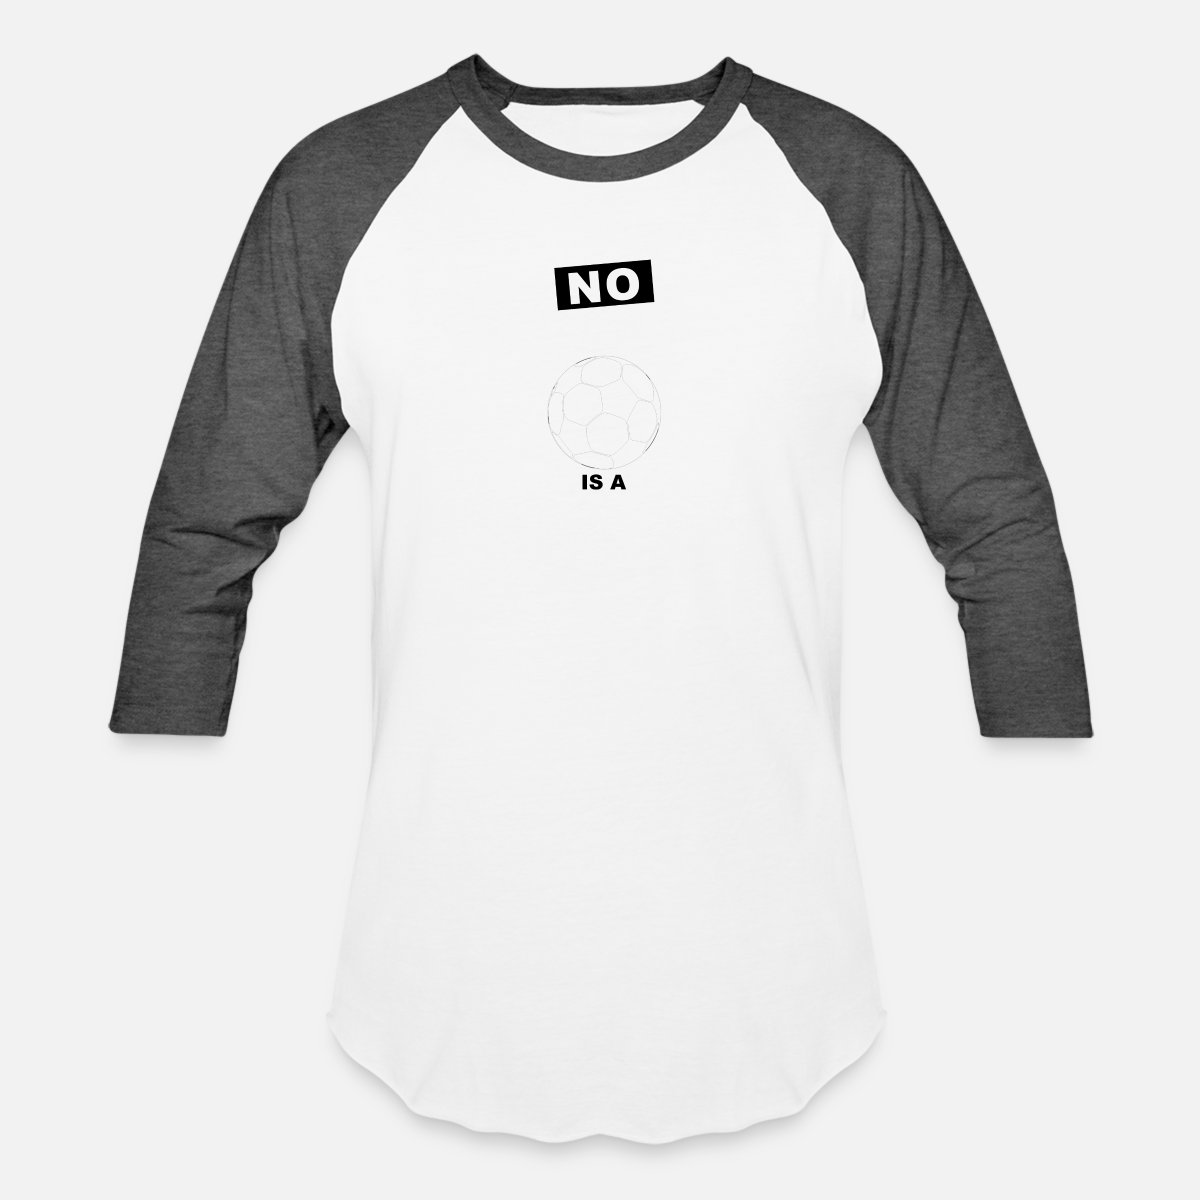 0cec6e3e Funny Soccer Goalie T Shirts - DREAMWORKS